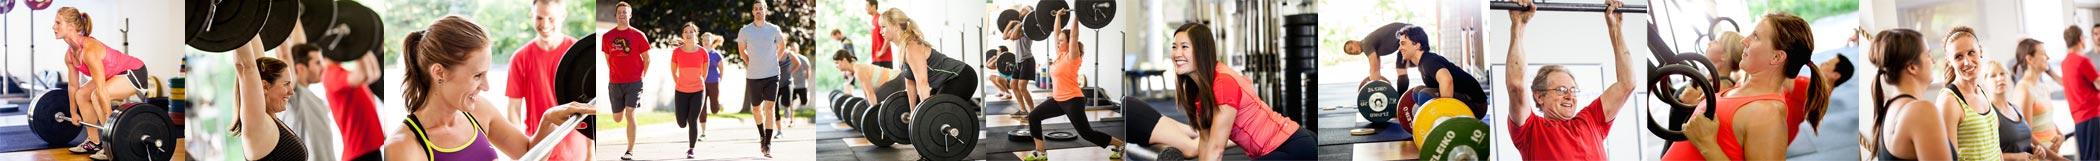 MSP Fitness - St. Louis Park, Minnesota